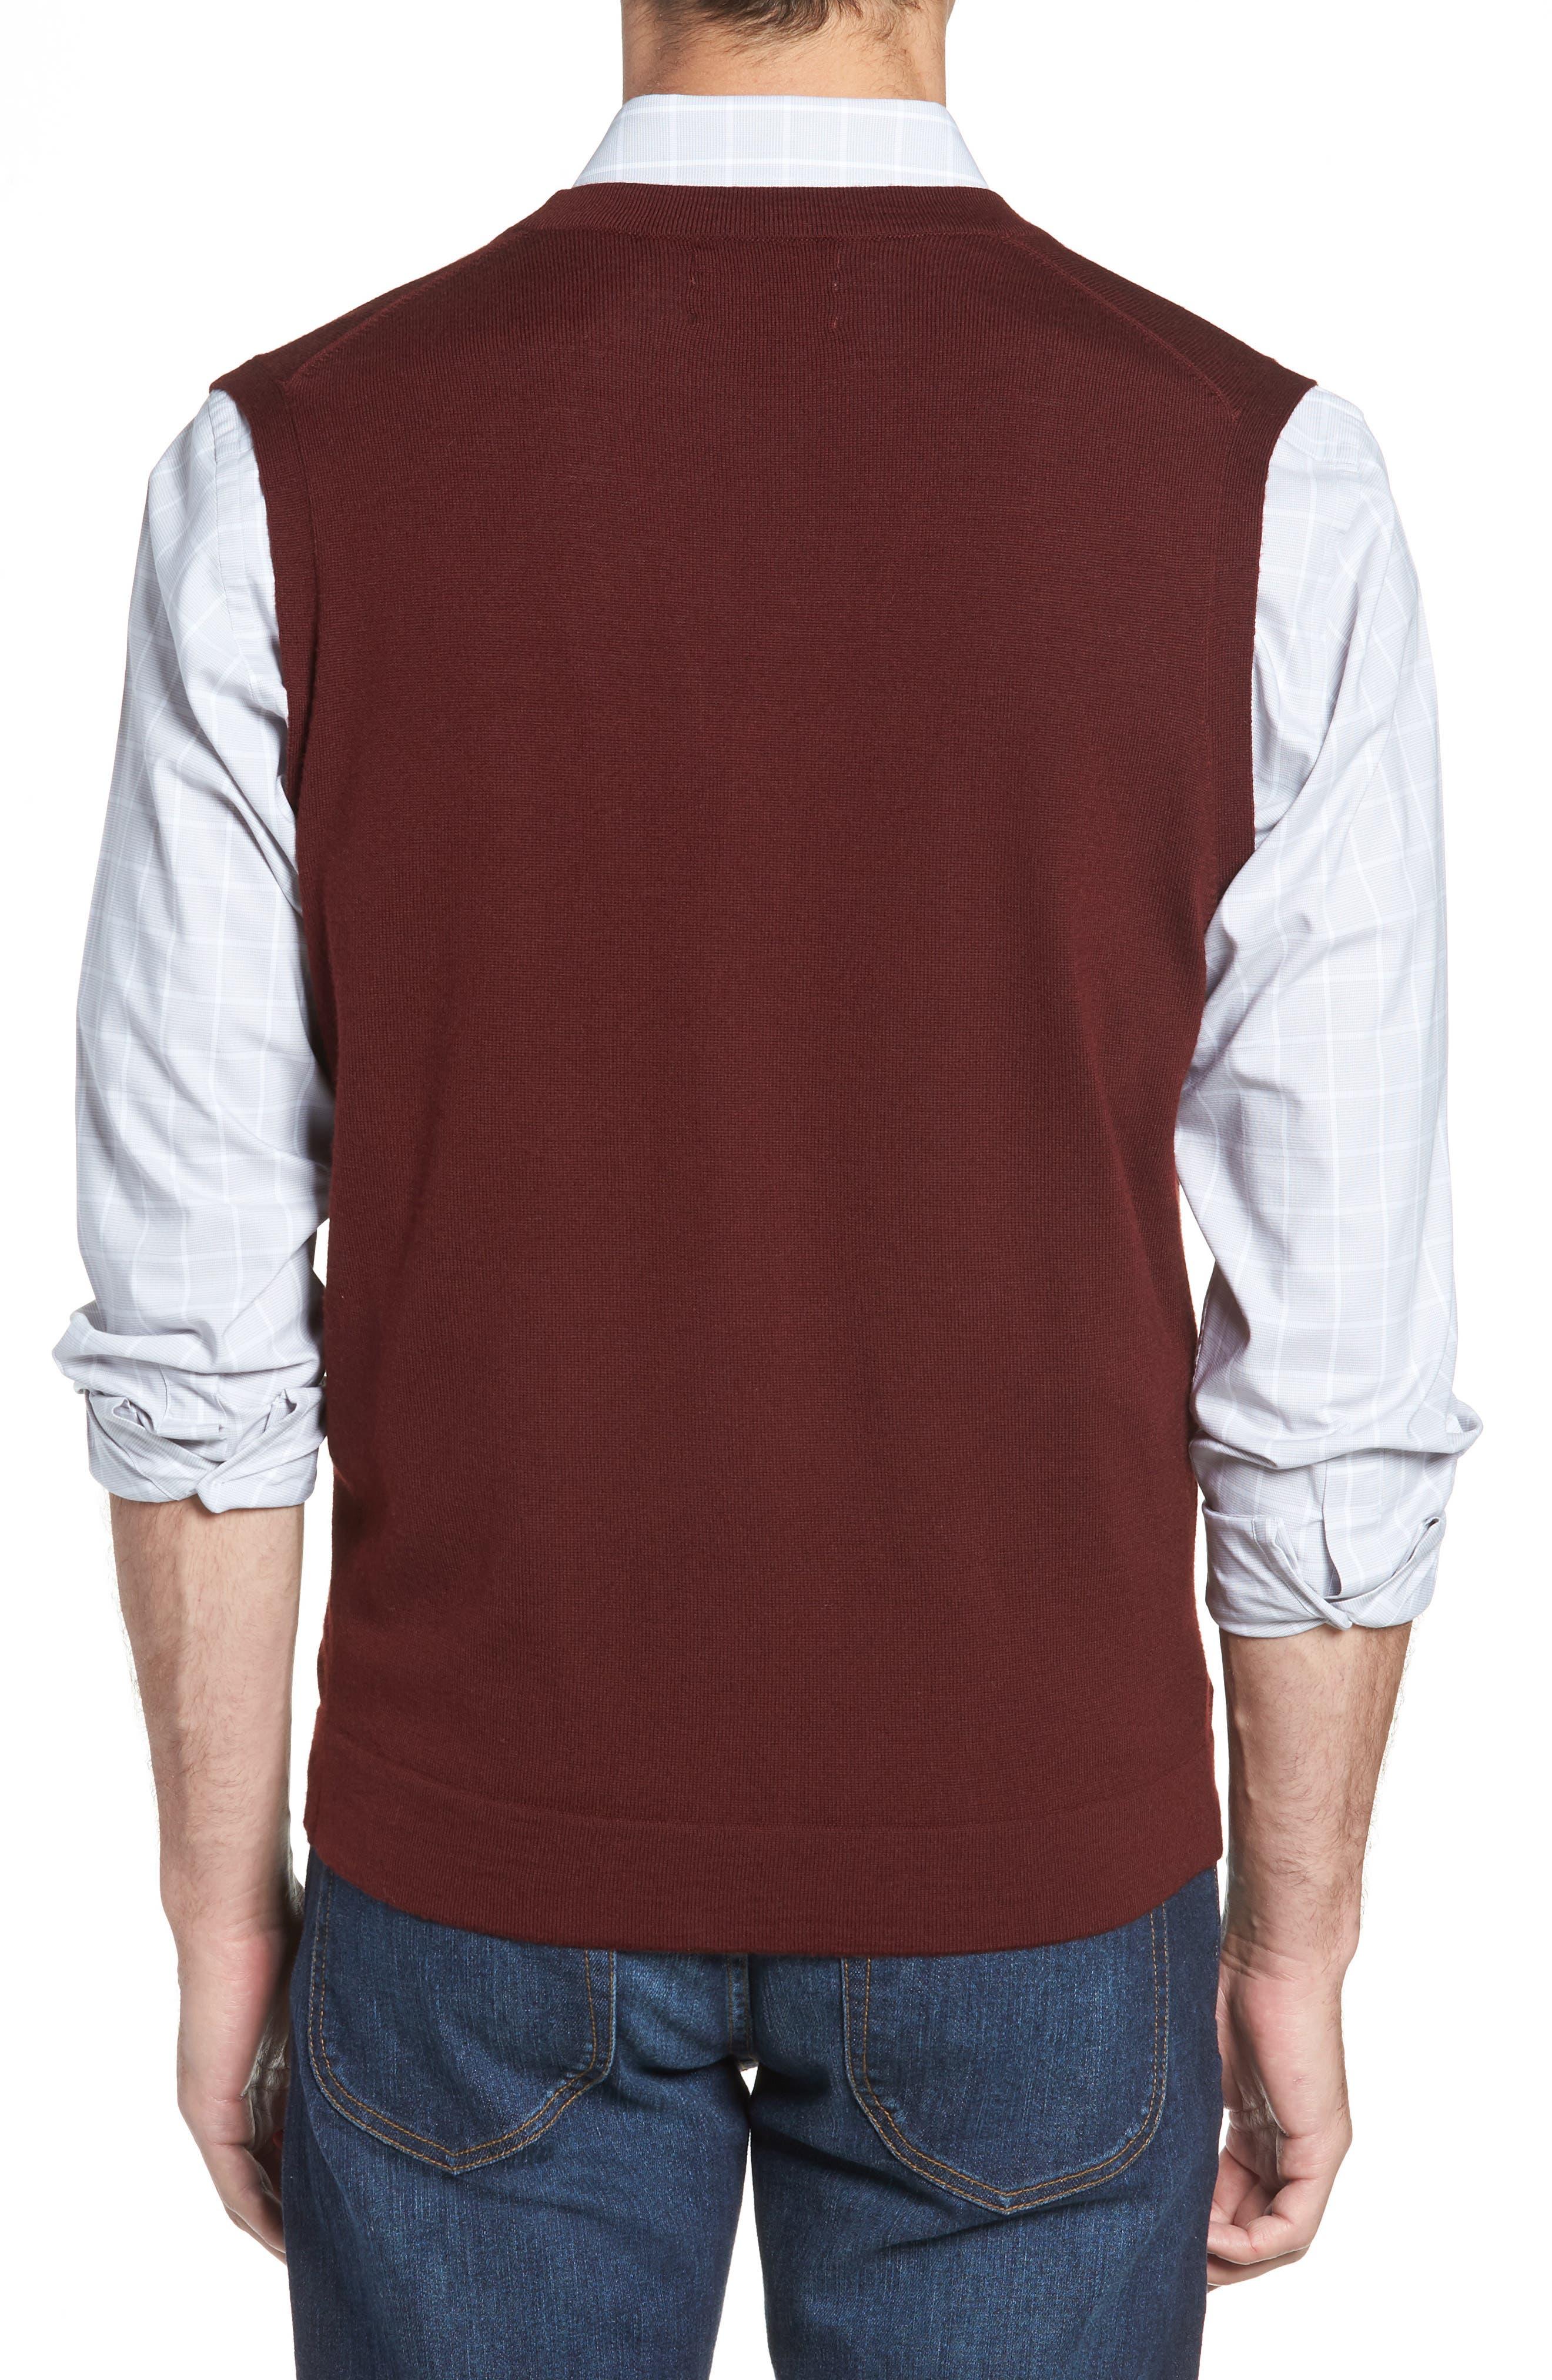 Merino Button Front Sweater Vest,                             Alternate thumbnail 2, color,                             930